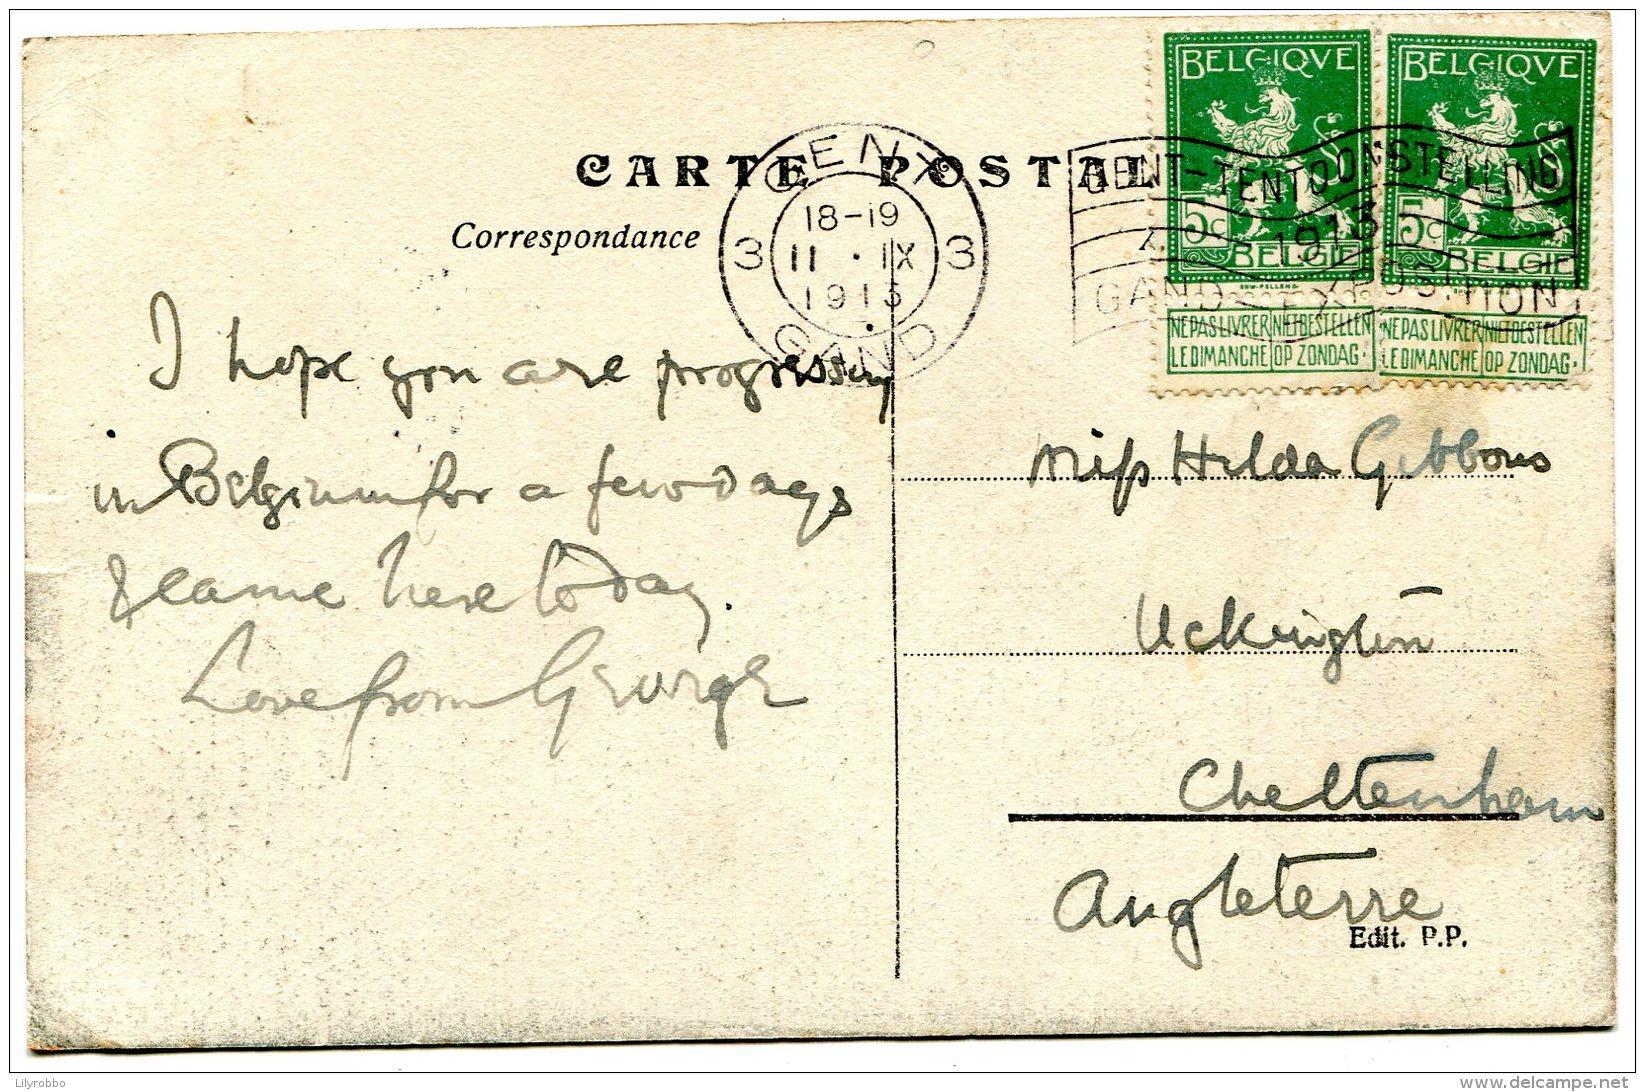 BELGIUM - Gand (Gent) - 1913 - Exposition Internationale  - Entree Principale -  VG Stamps And Postmark - Exposiciones